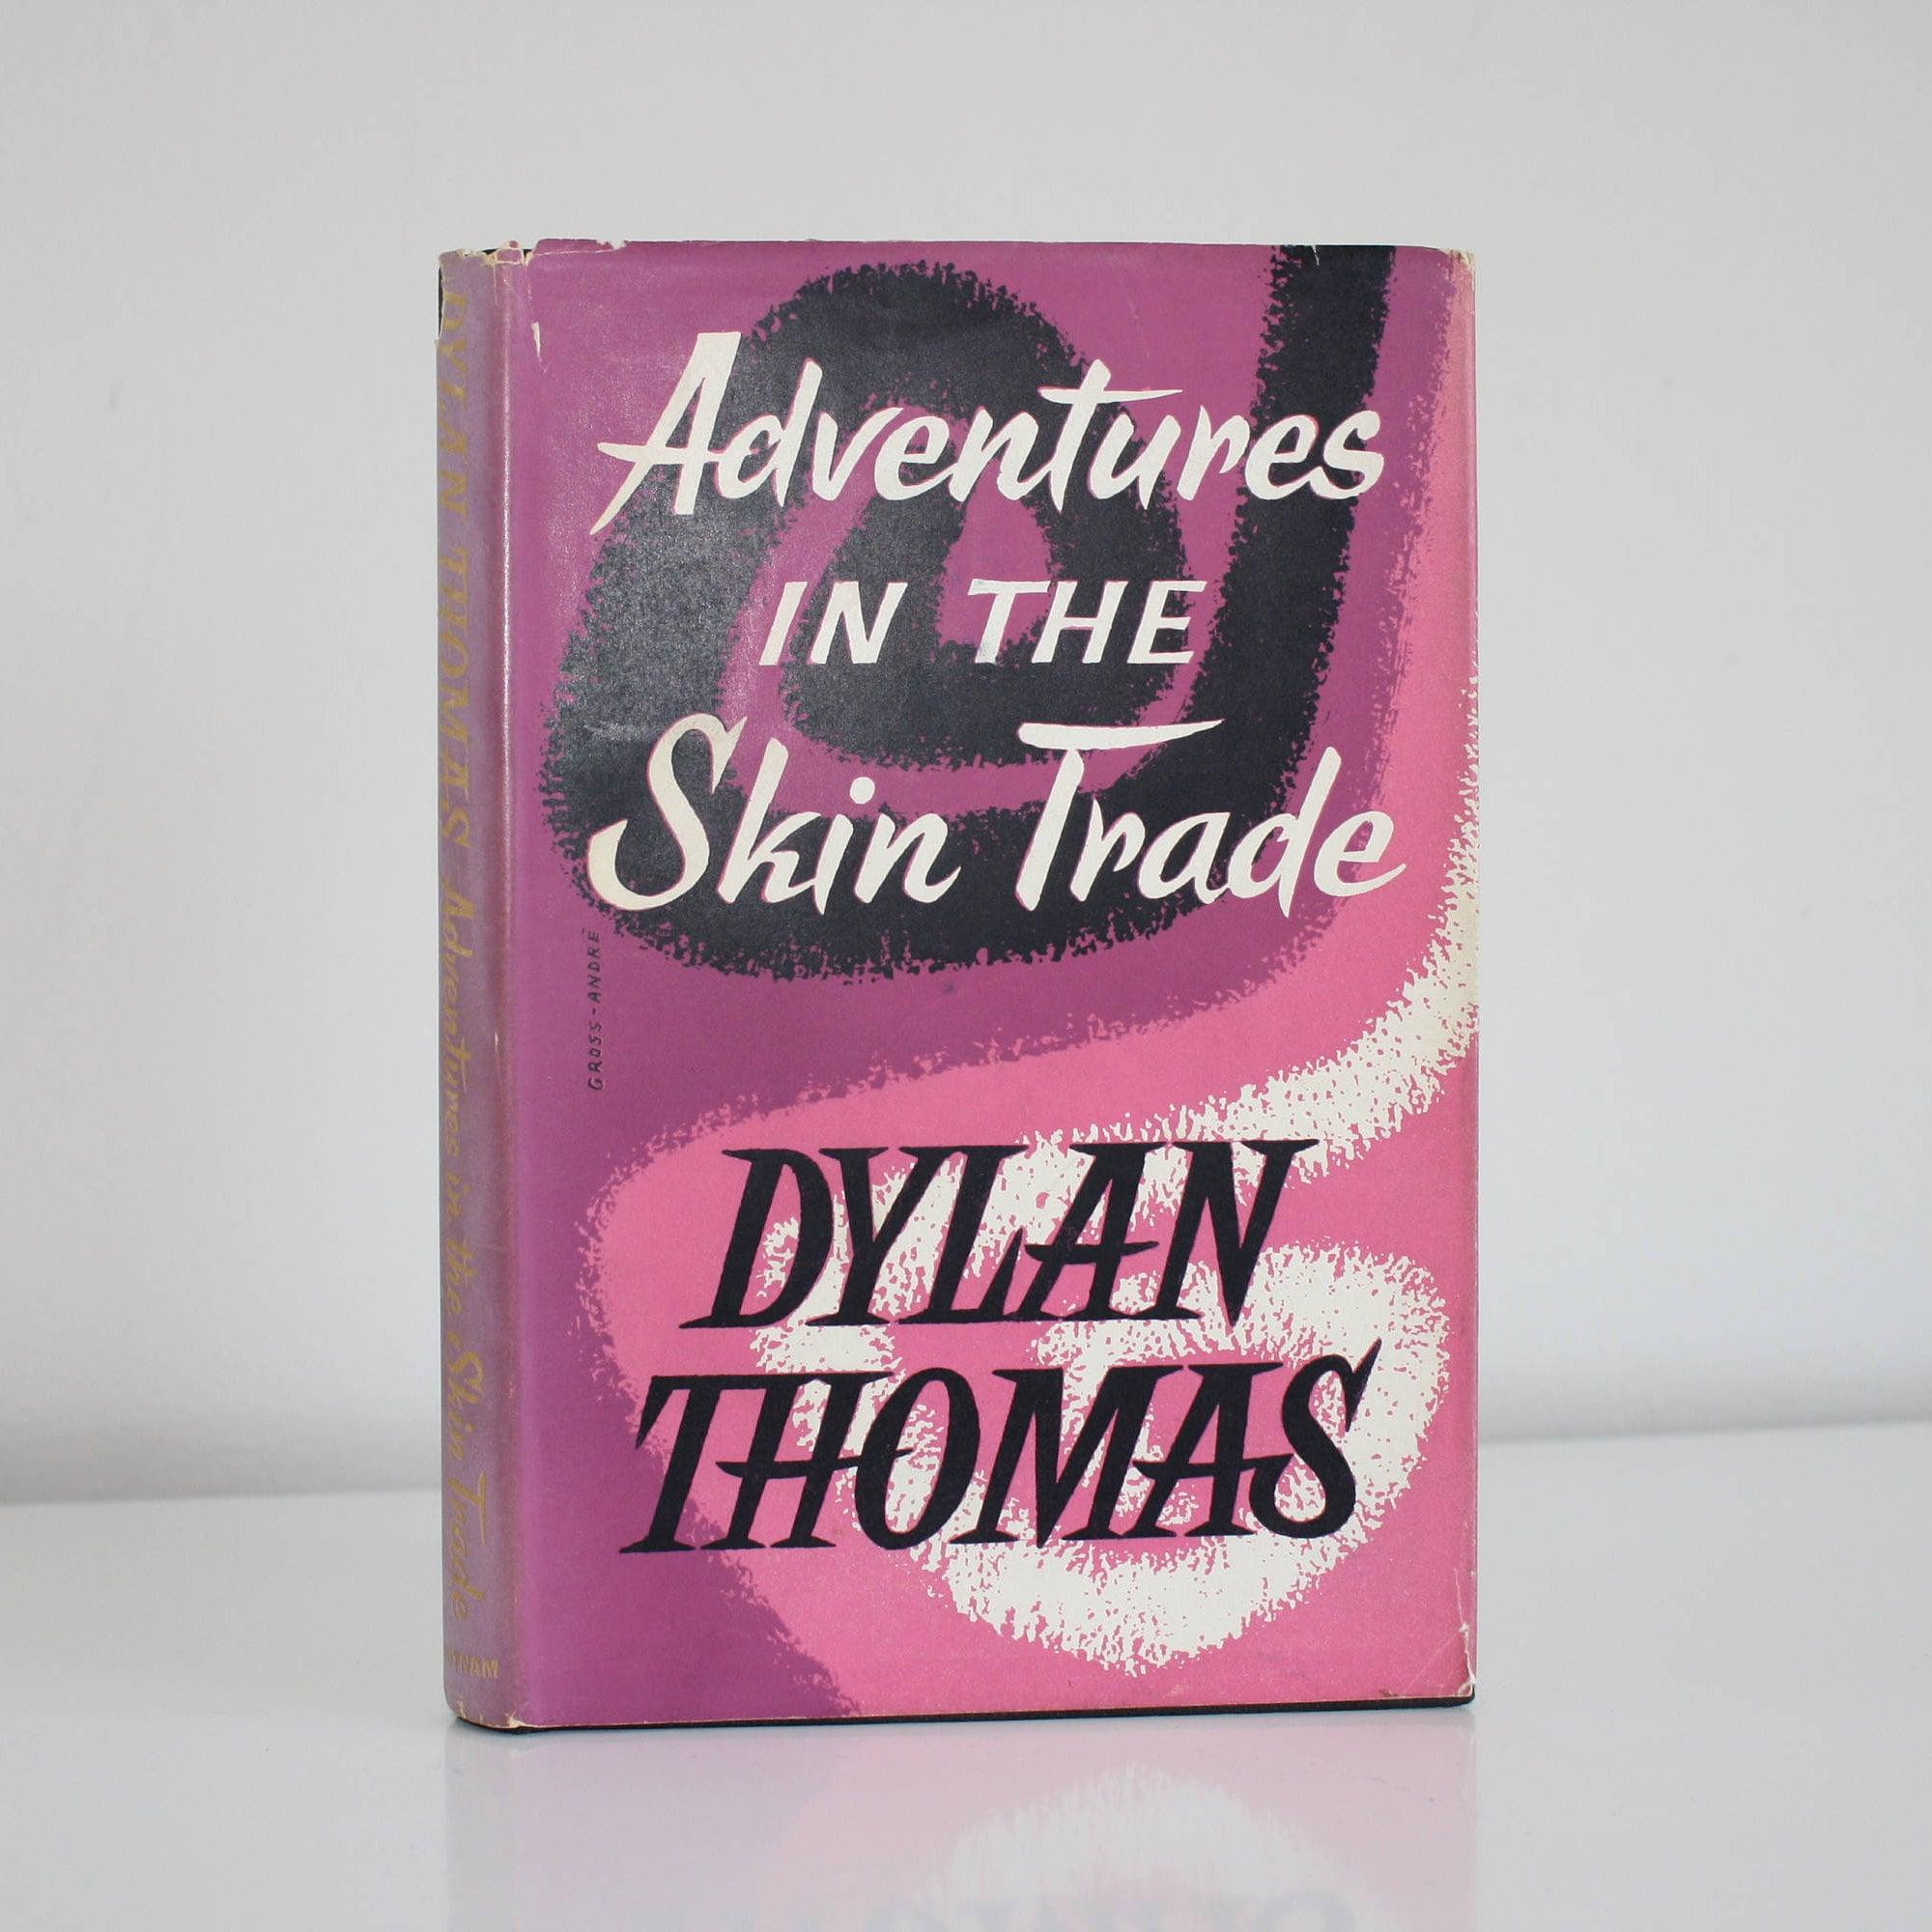 Dylan Thomas  Adventures in the Skin Trade 1950s vintage hardback book Putnam London